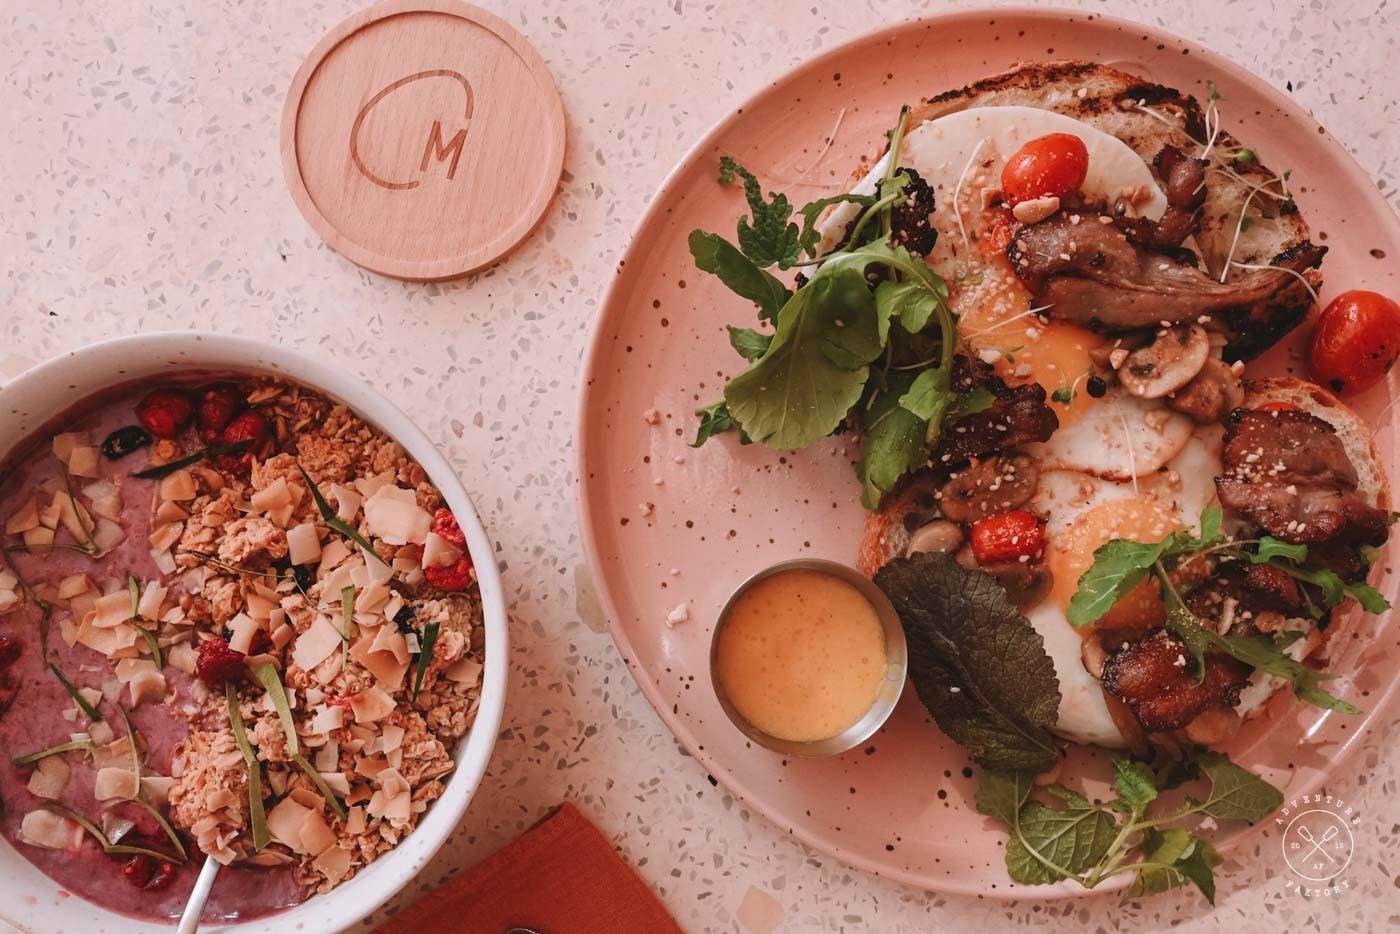 Cafe Marcel Ho Chi Minh City